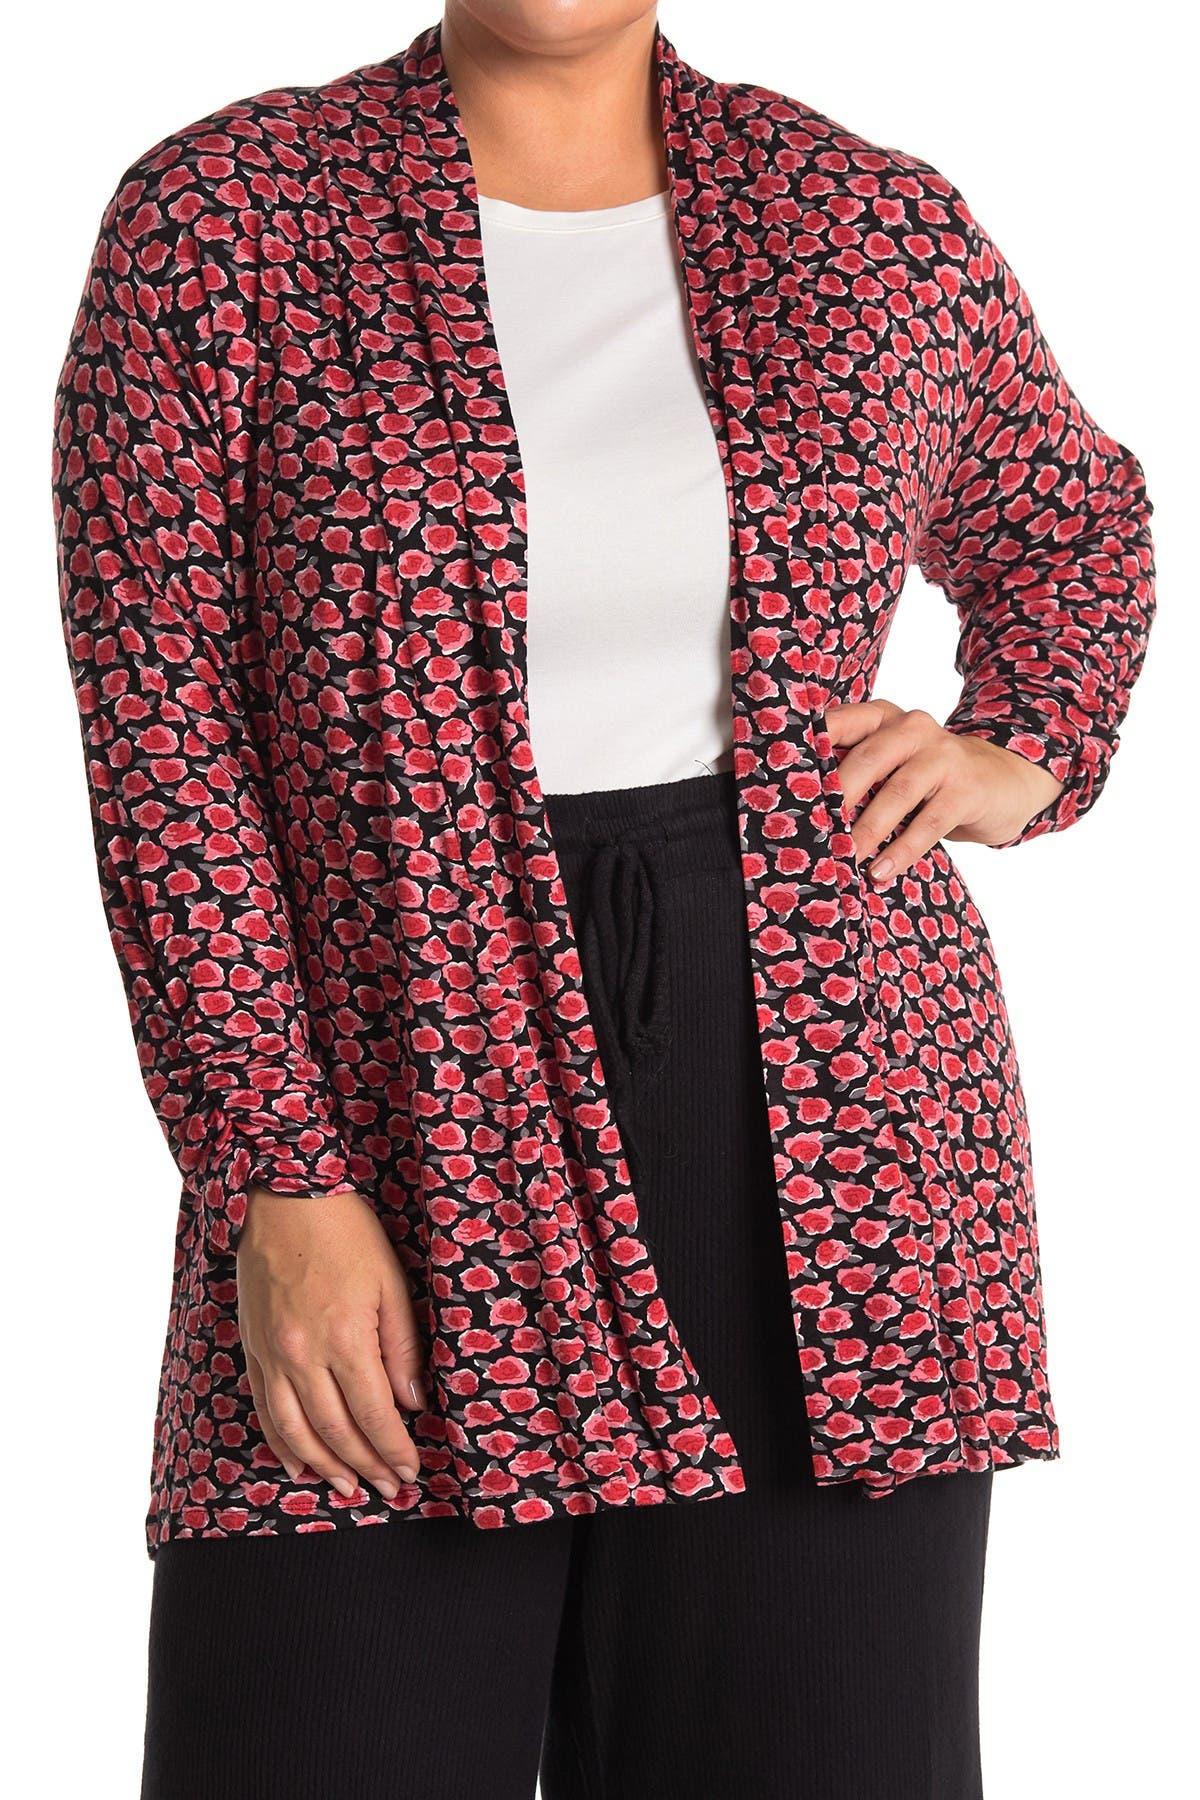 Image of Bobeau Knit Patterned Open Front Cardigan